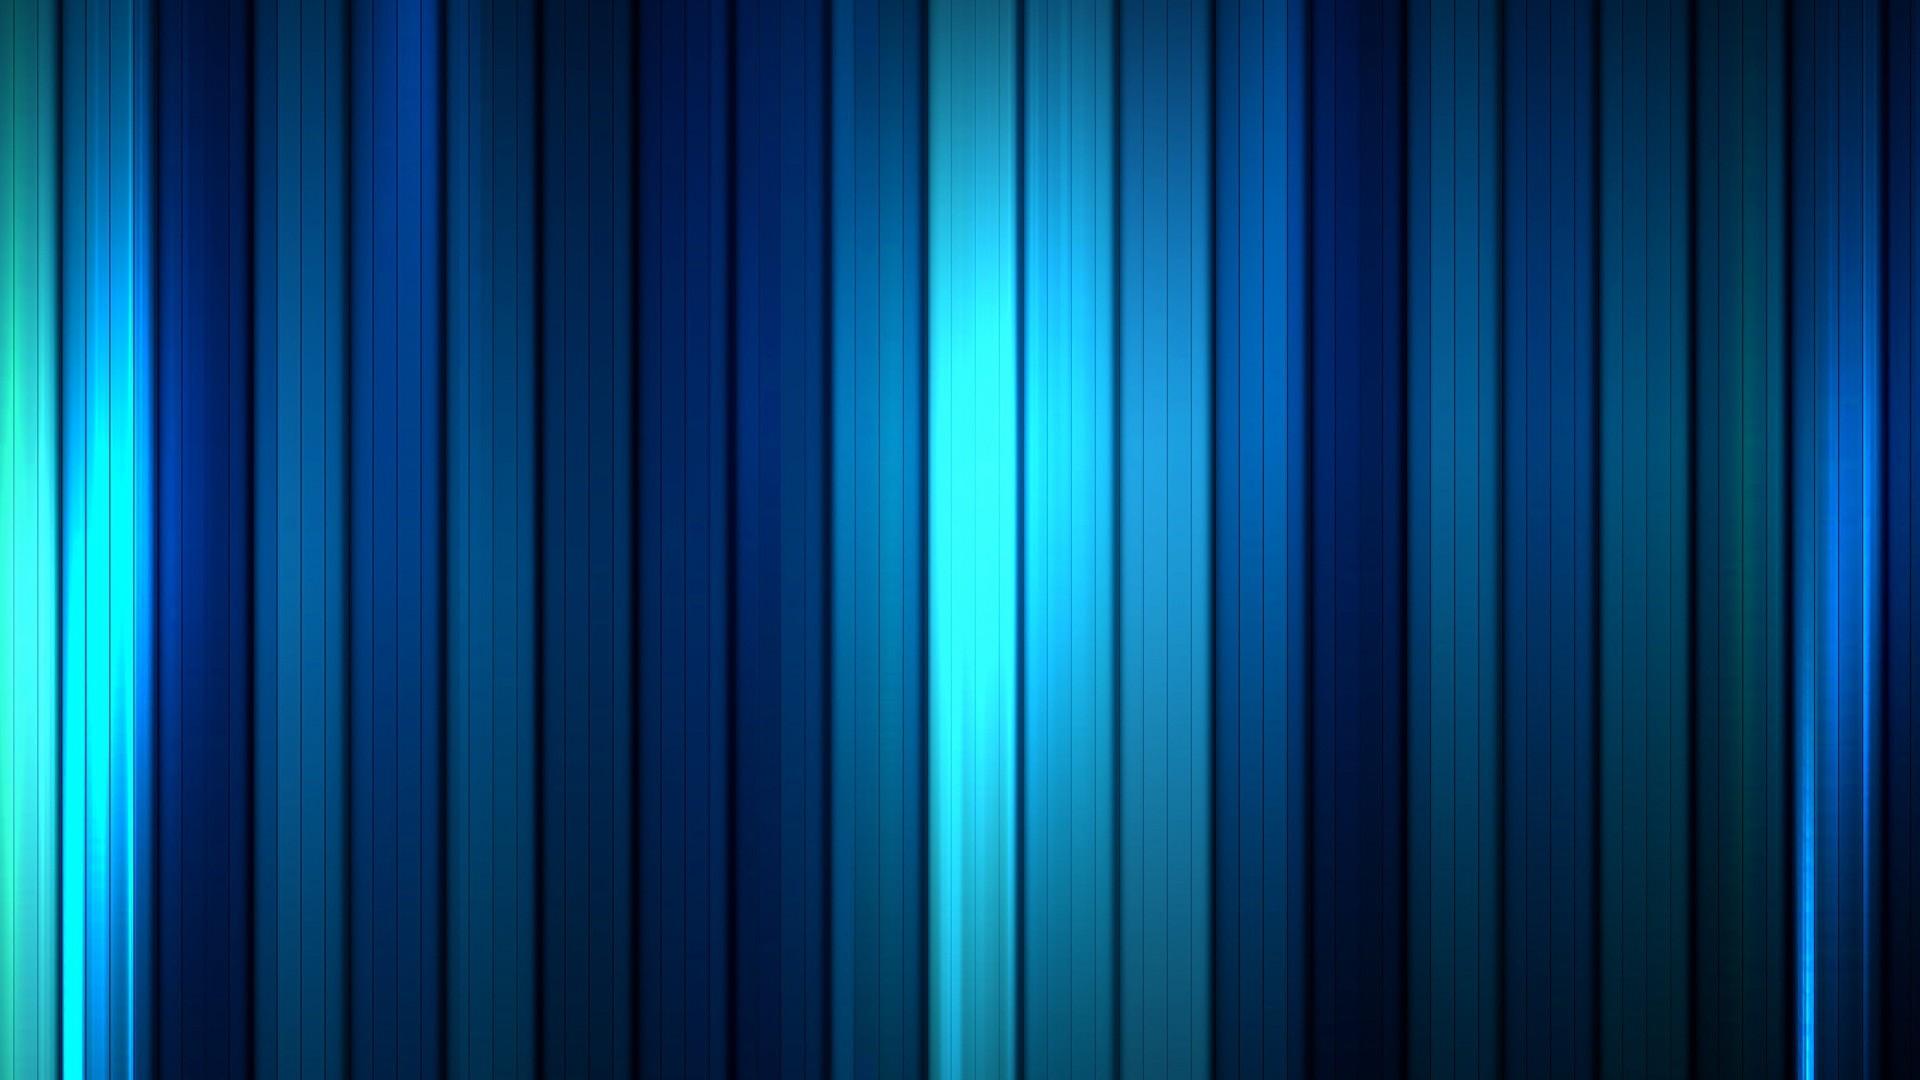 Navy blue perpendicular gloominess desktop wall | HD Wallpapers Rocks